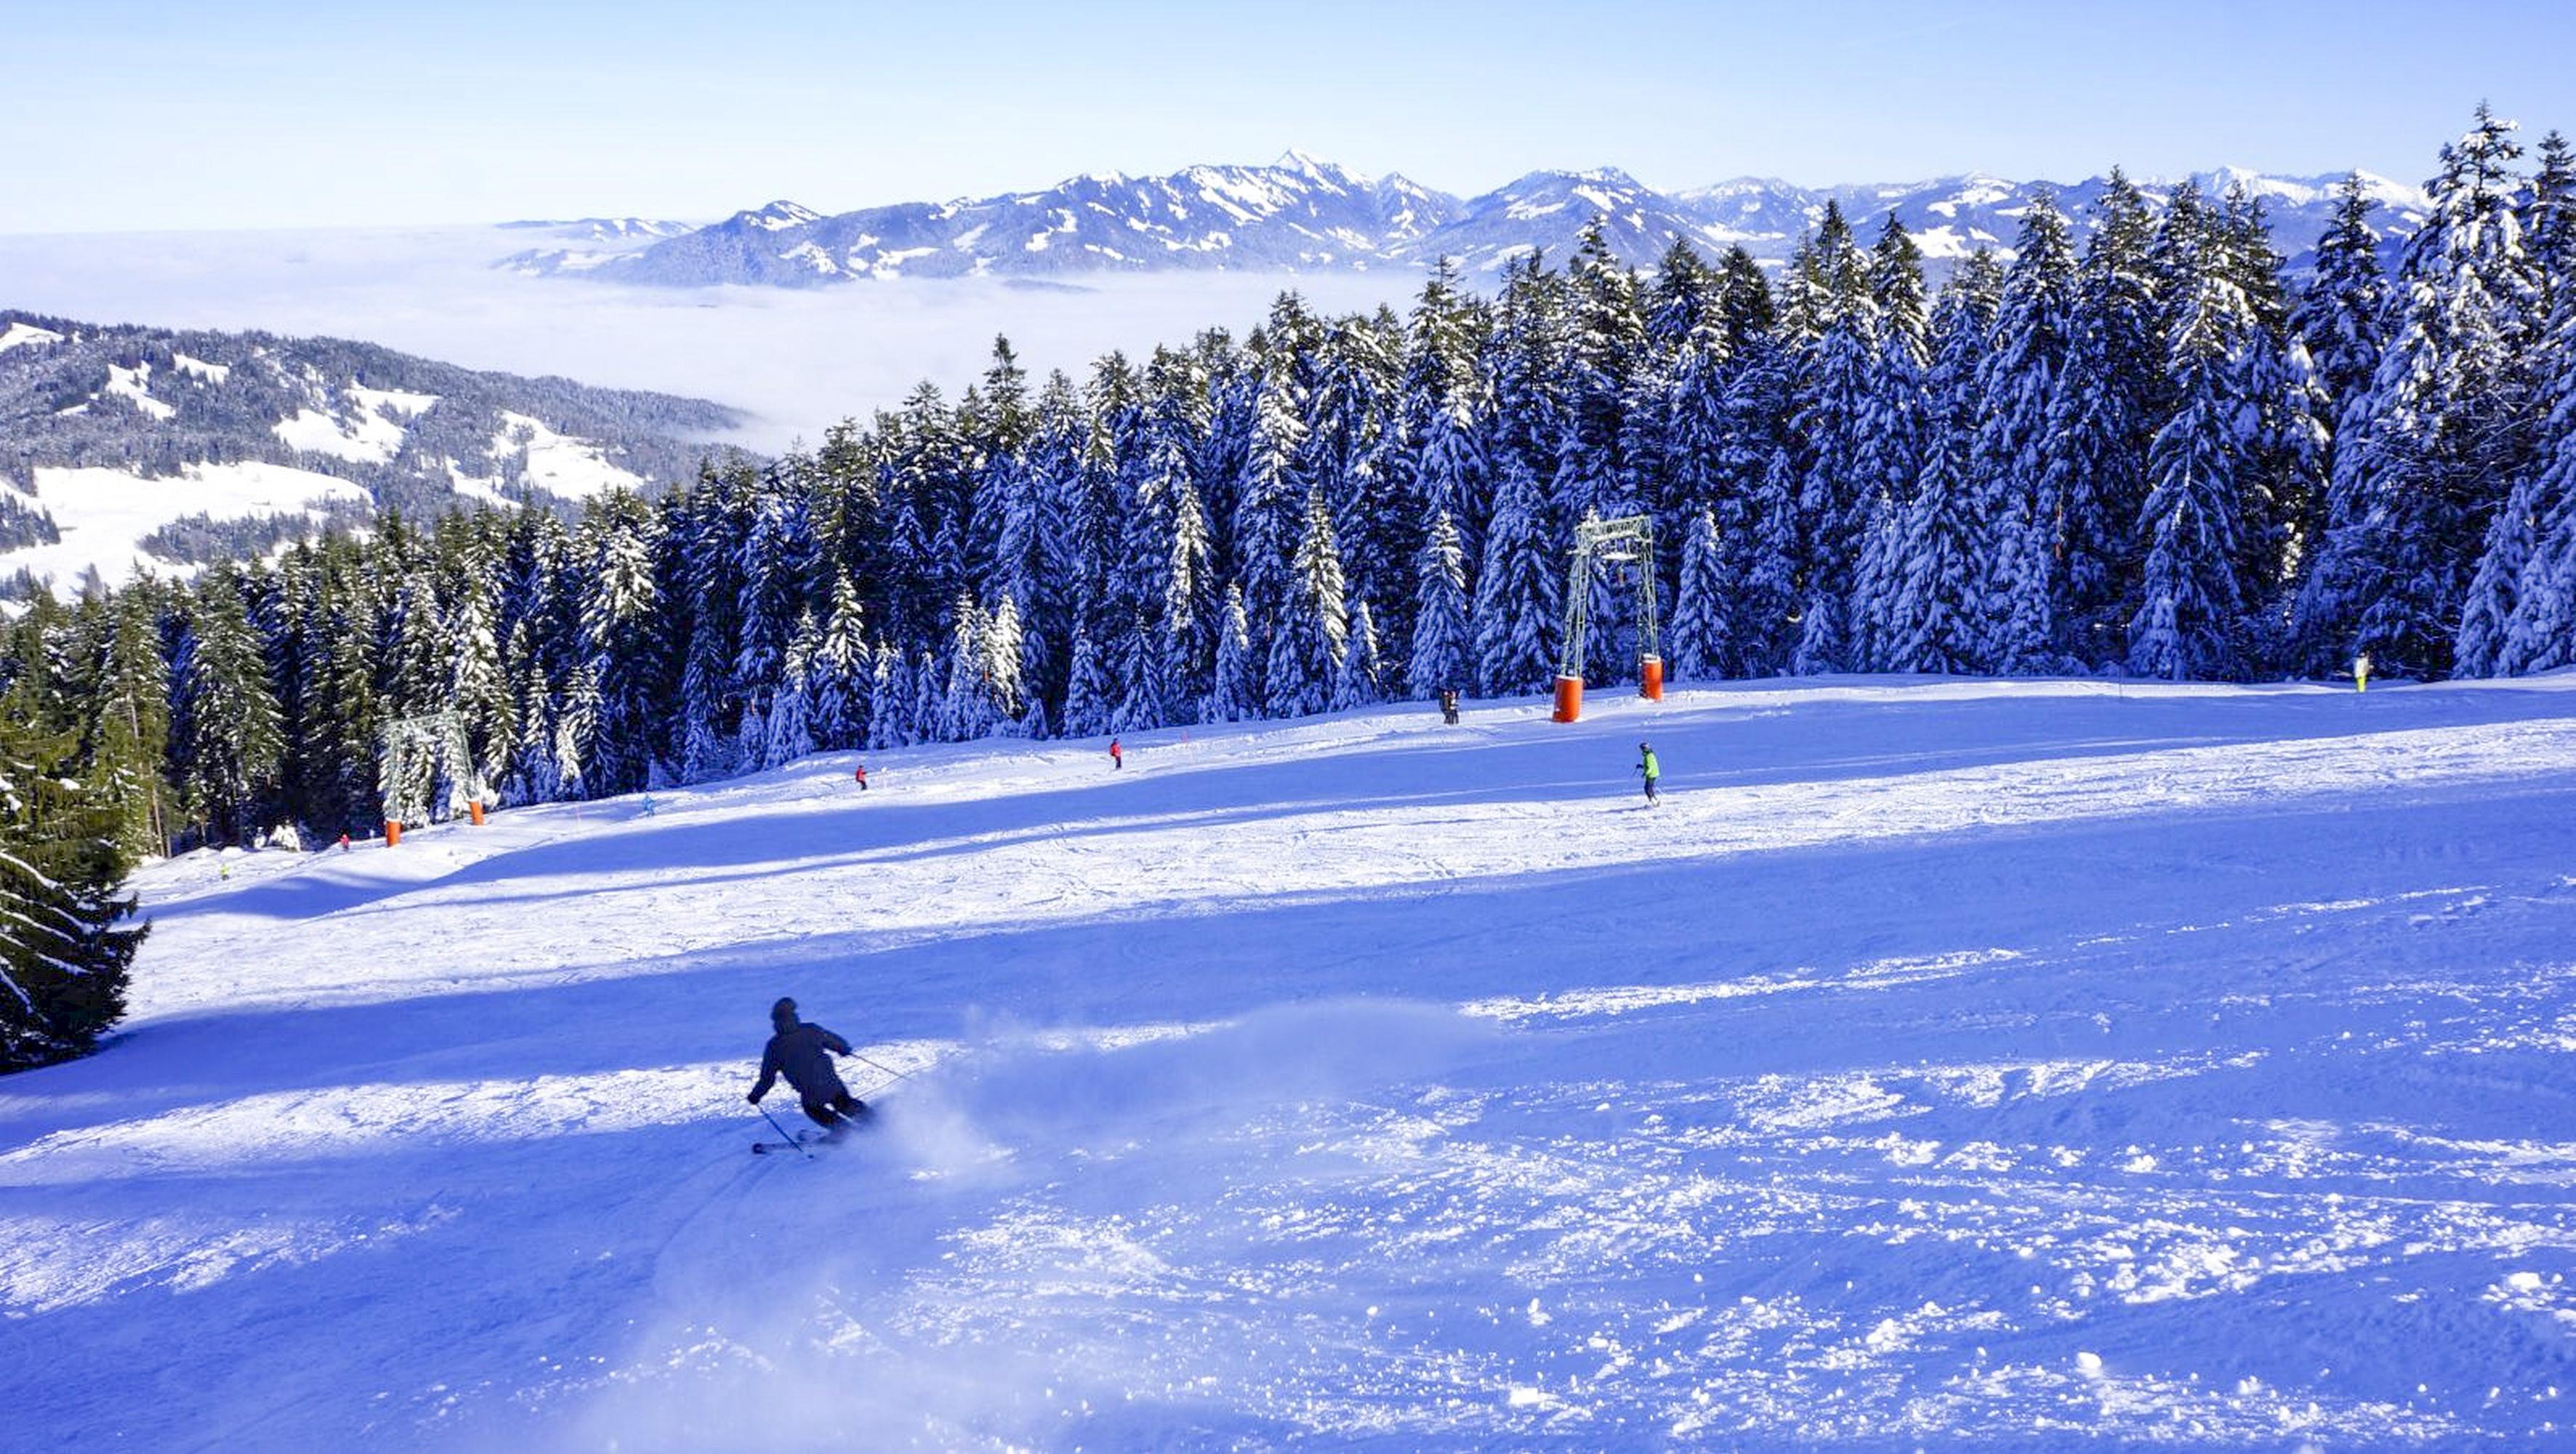 Skigebiet Bödele, Hochälpele, Bergstation Seeblick / Copyright© Alois Metzler